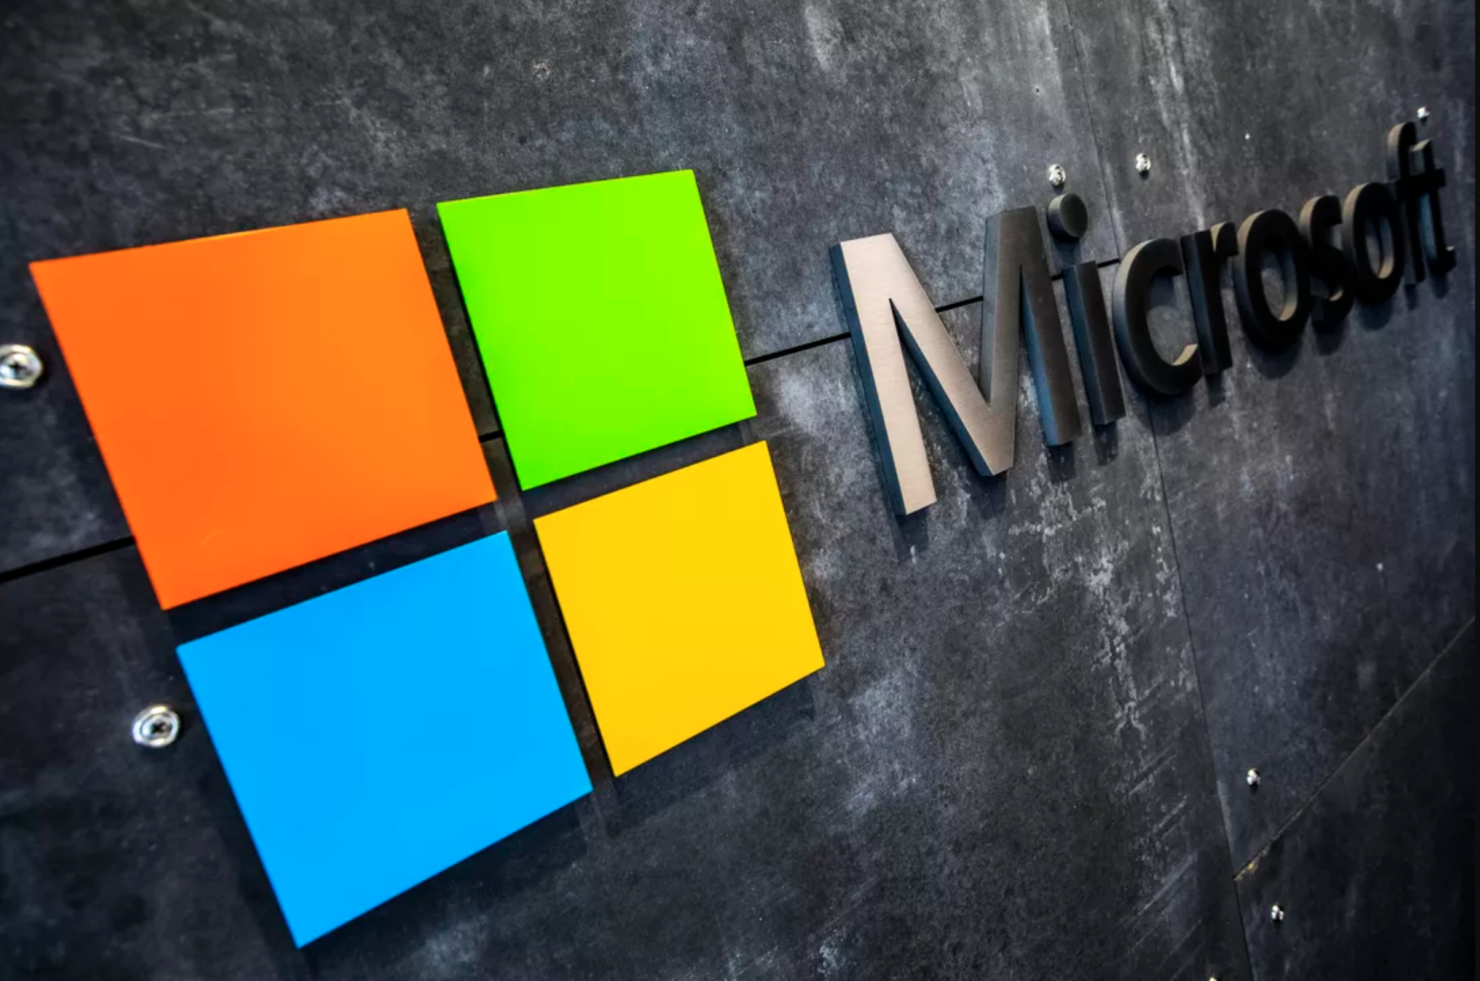 Microsoft build 2020 cancel coronavirus covid-19 xbox live microsoft outage windows 10